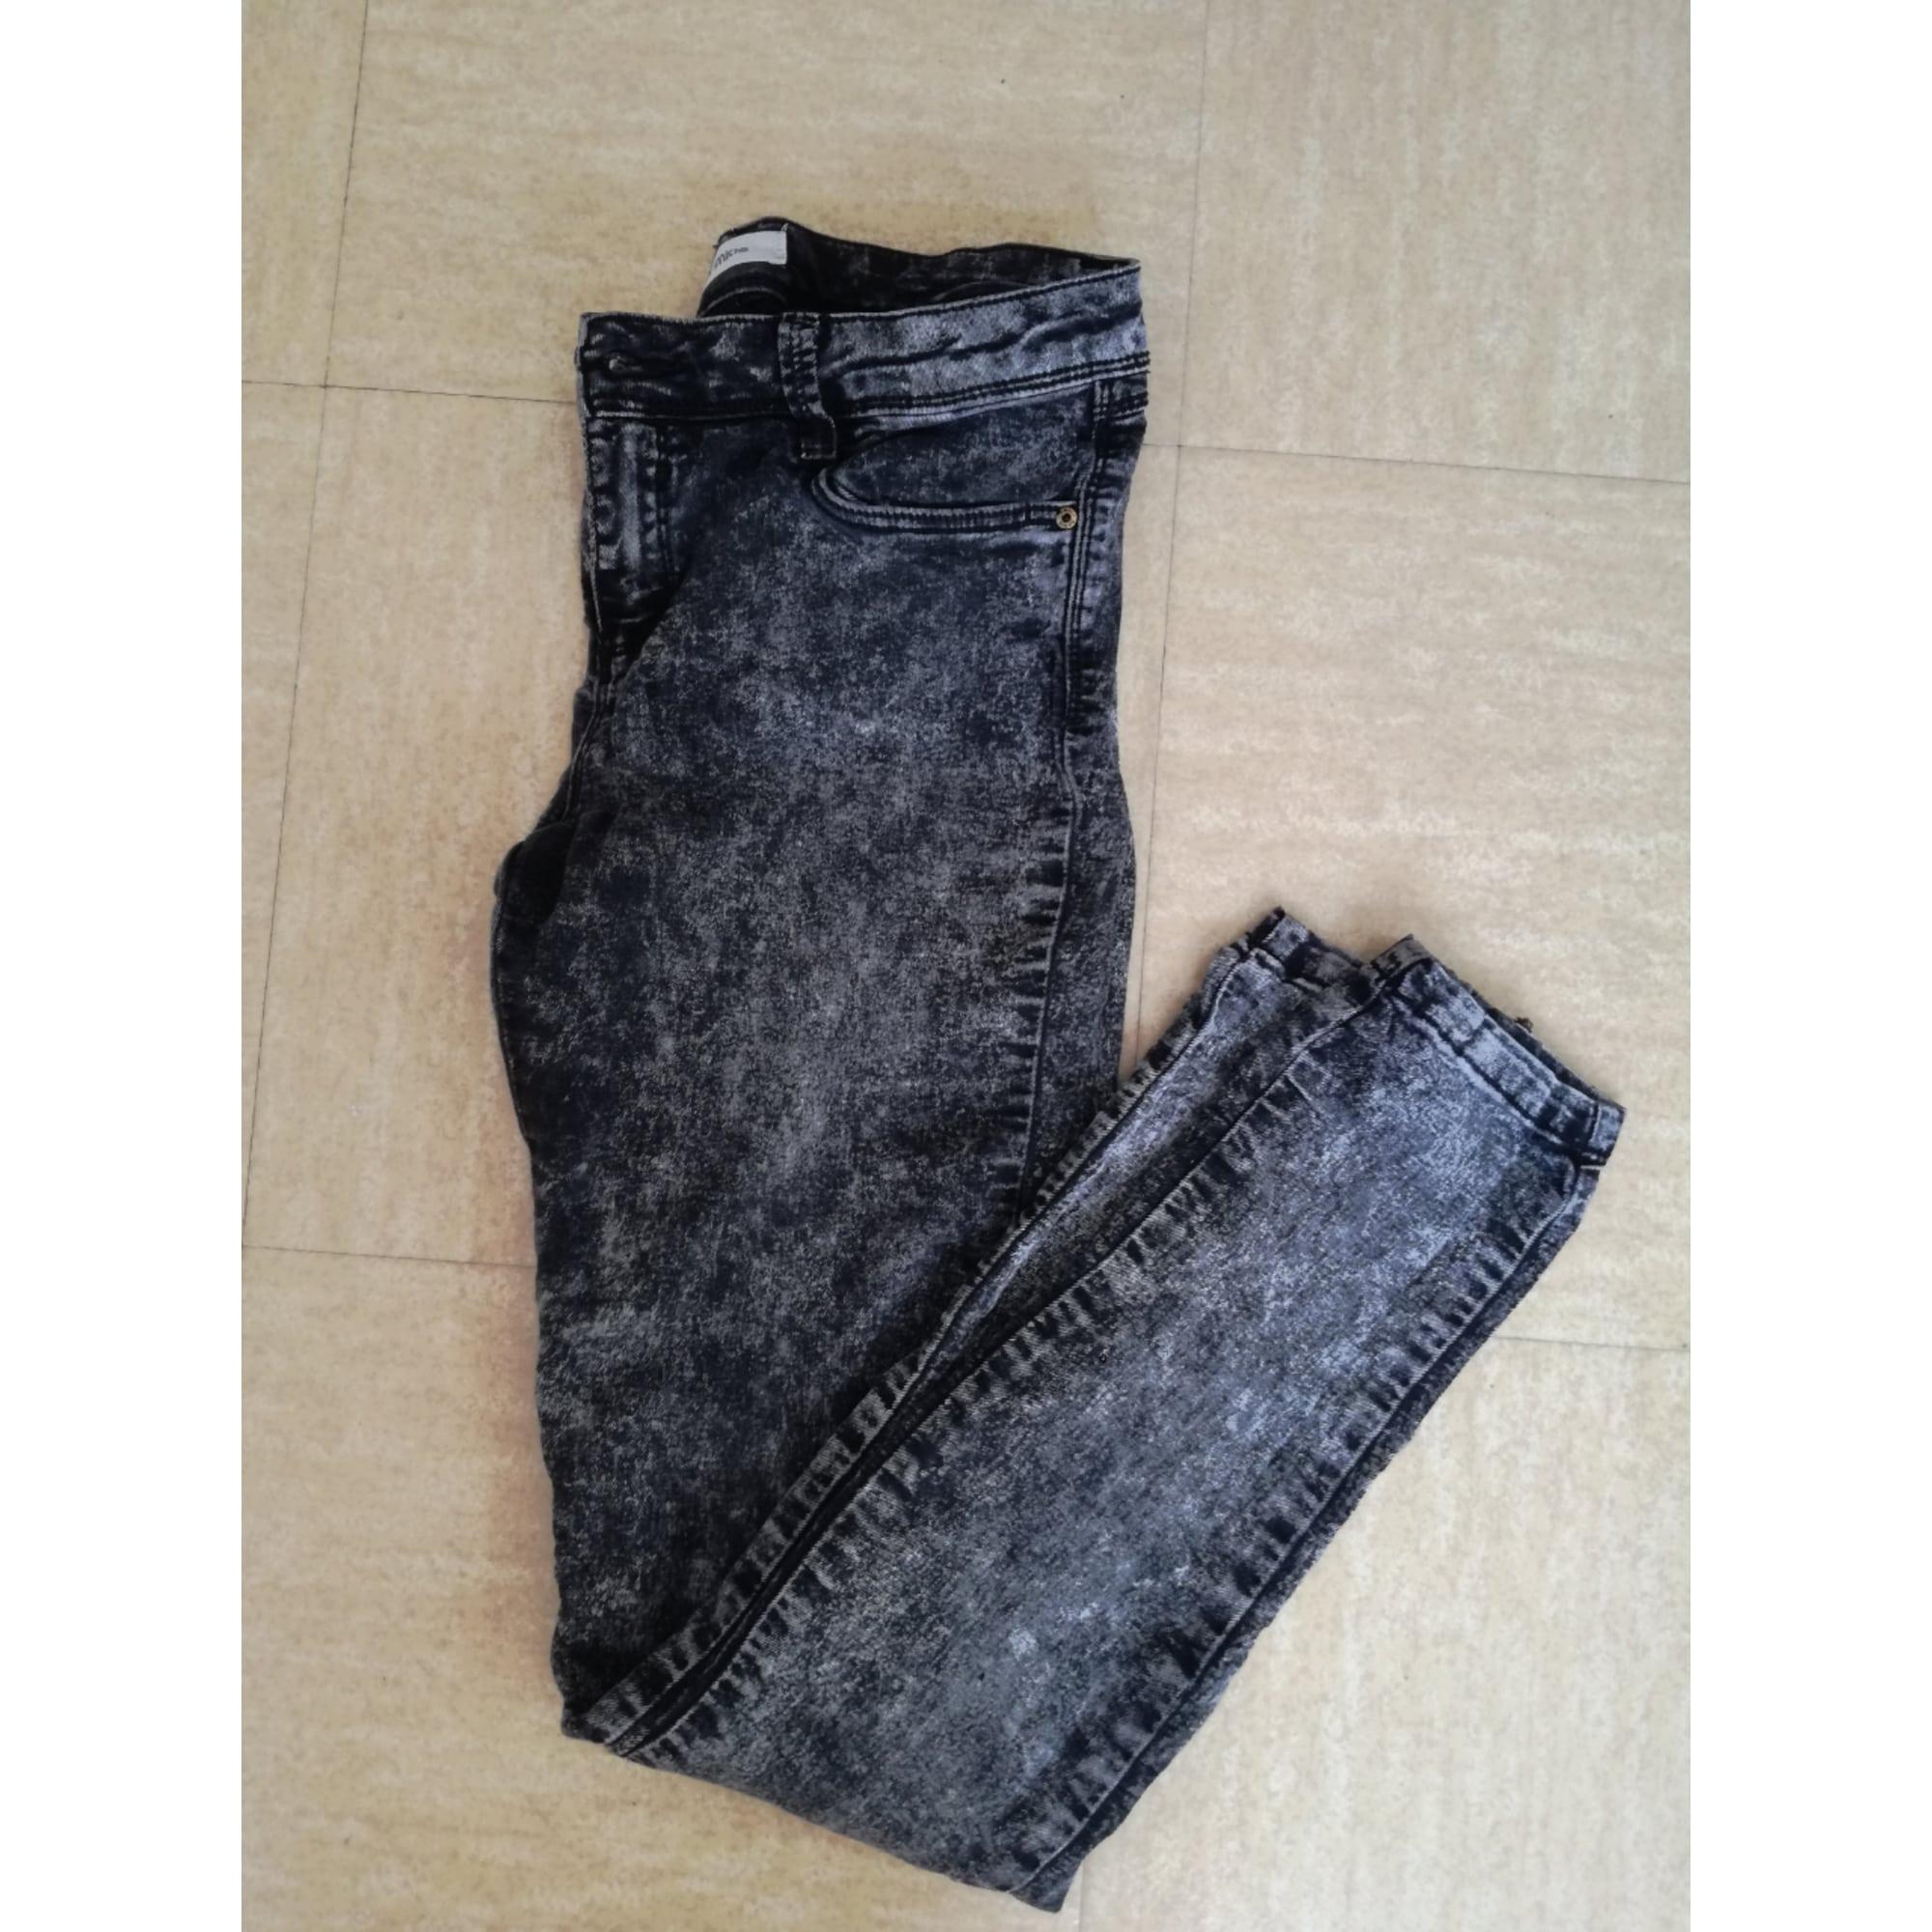 24c557a2843c Jeans slim PIMKIE W29 (T 38-40) noir - 7360129